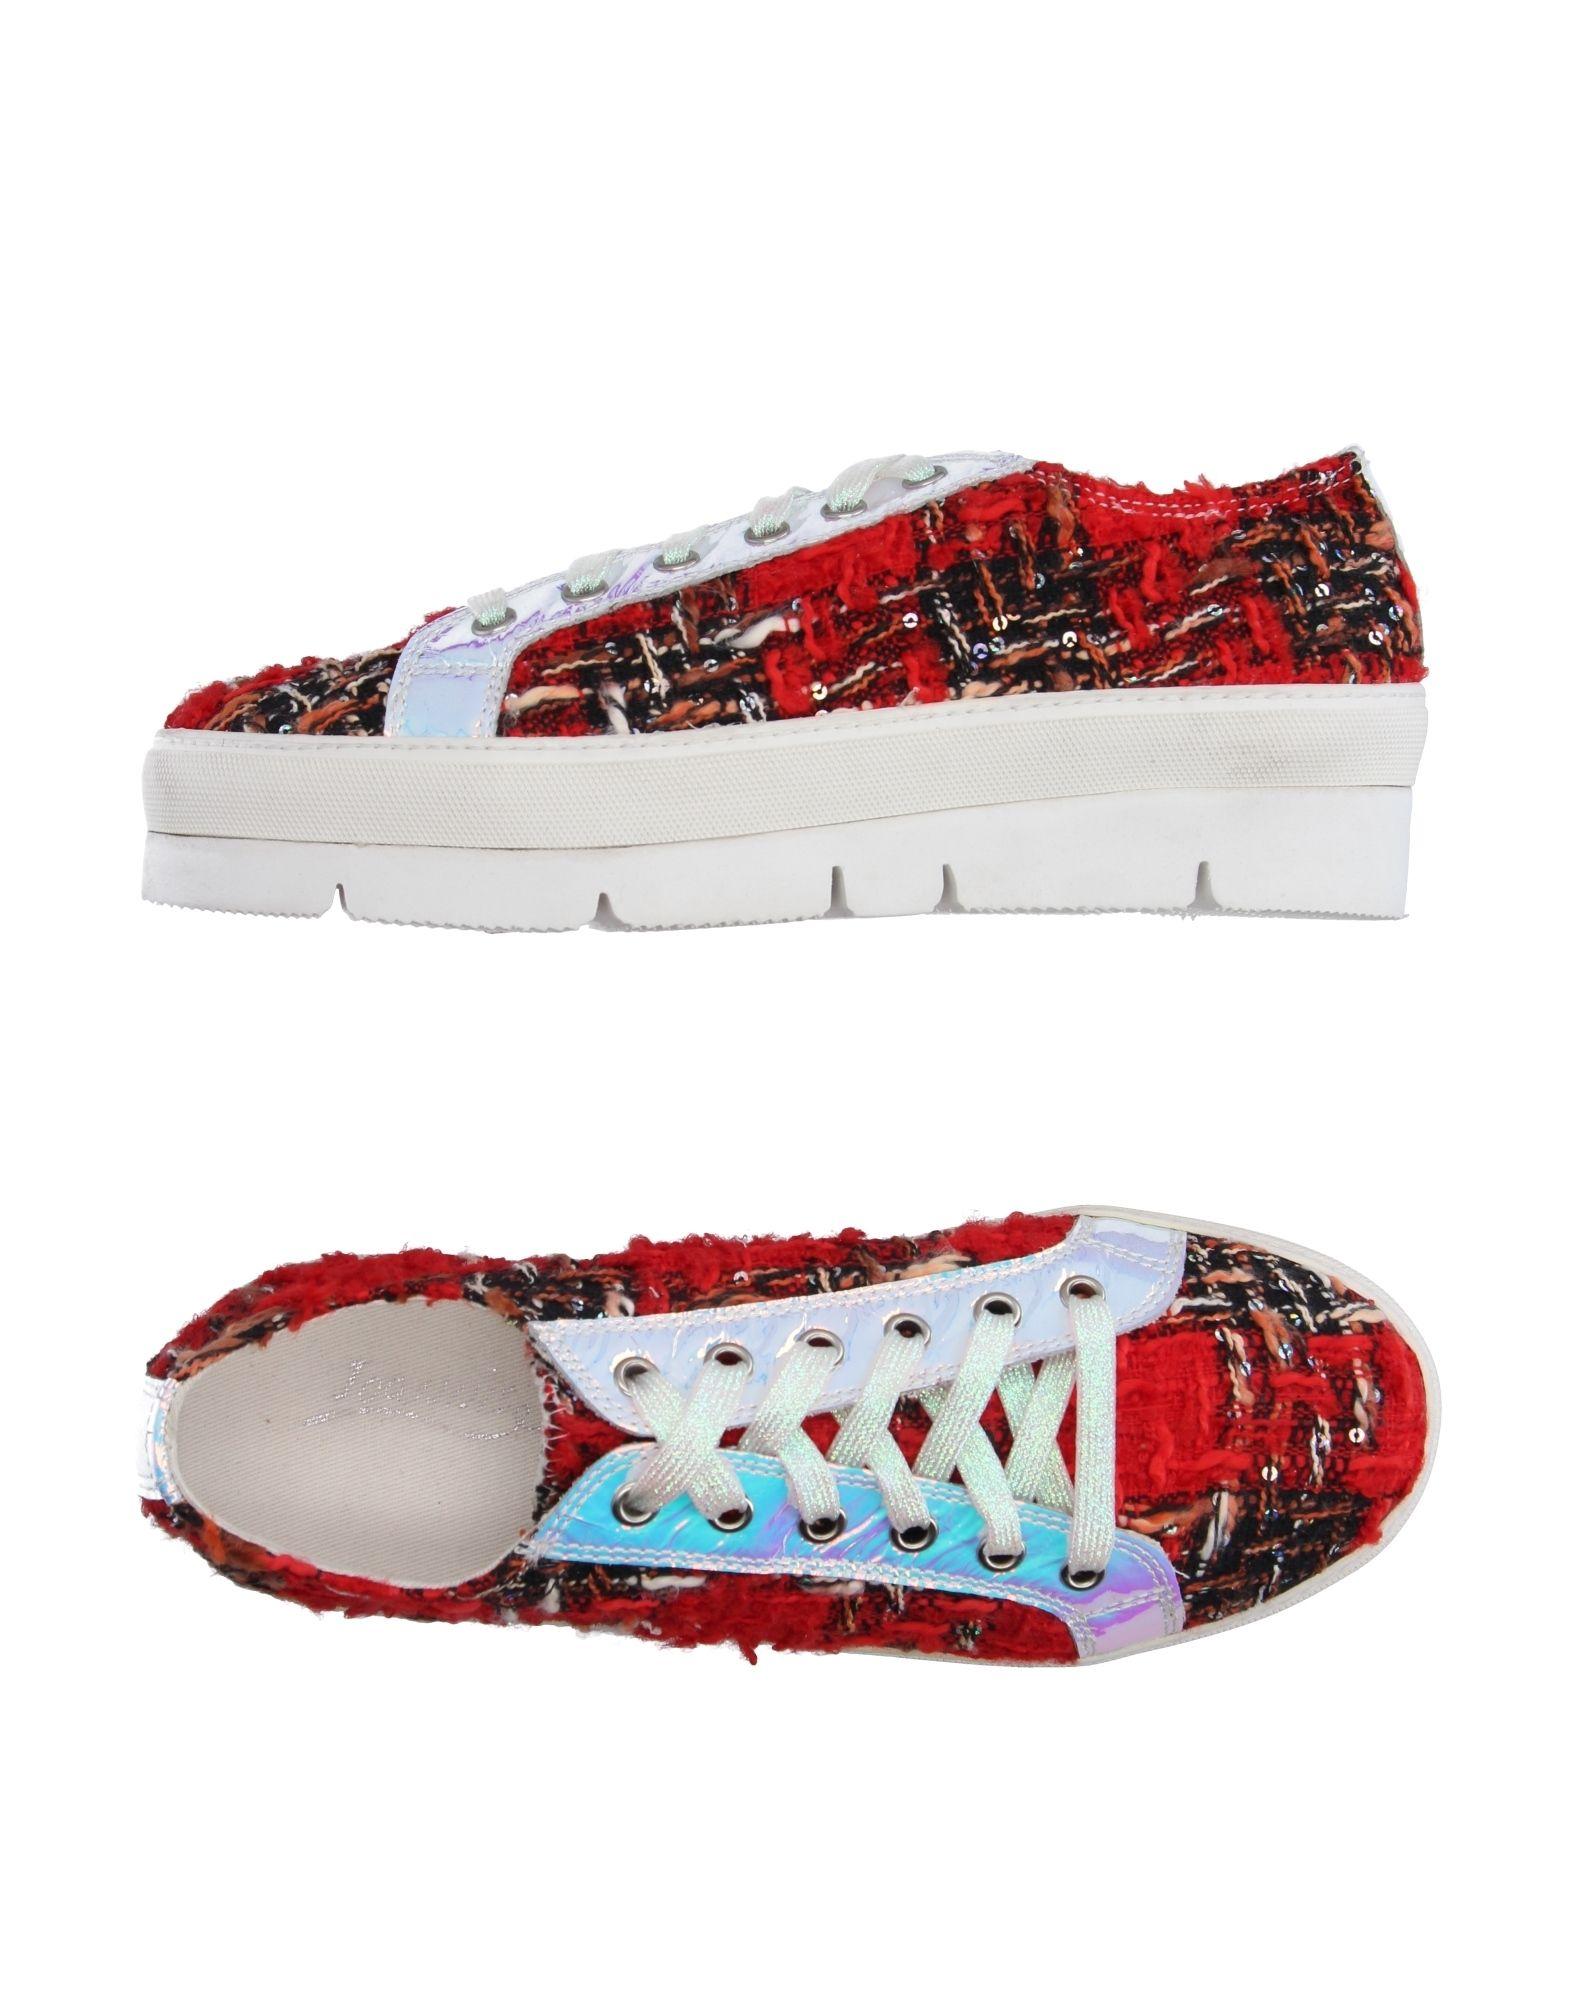 IOANNIS Sneakers in Red